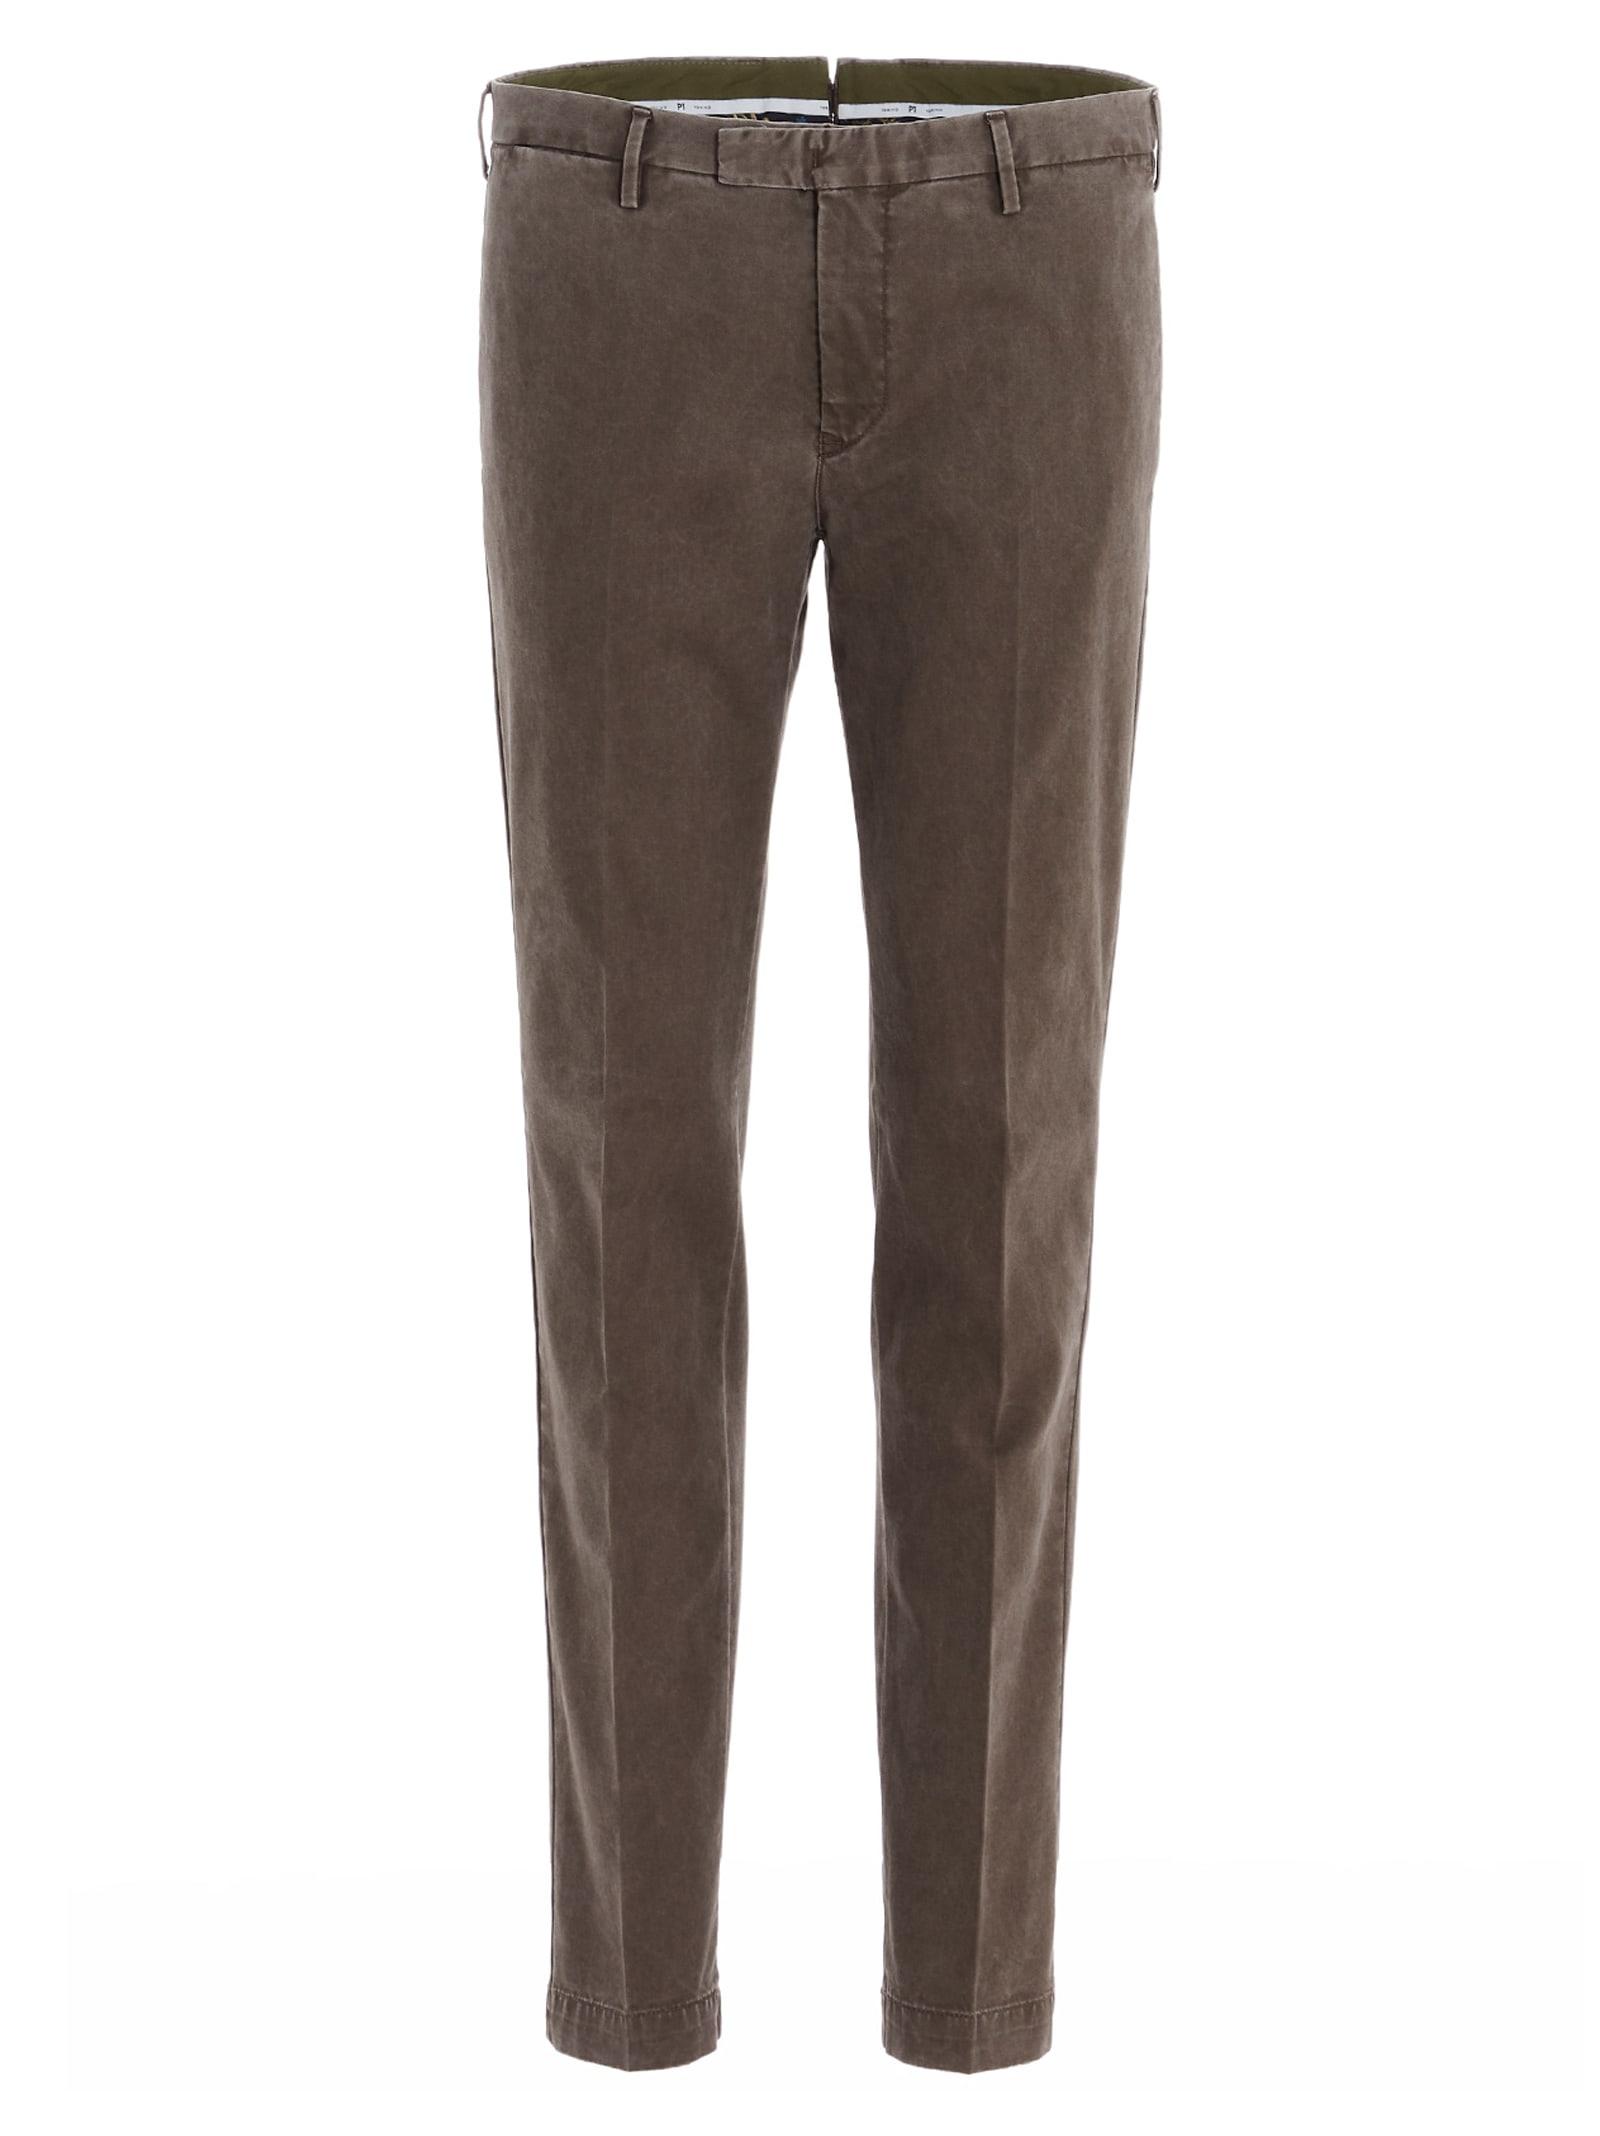 Pt01 skinny Fit Pants